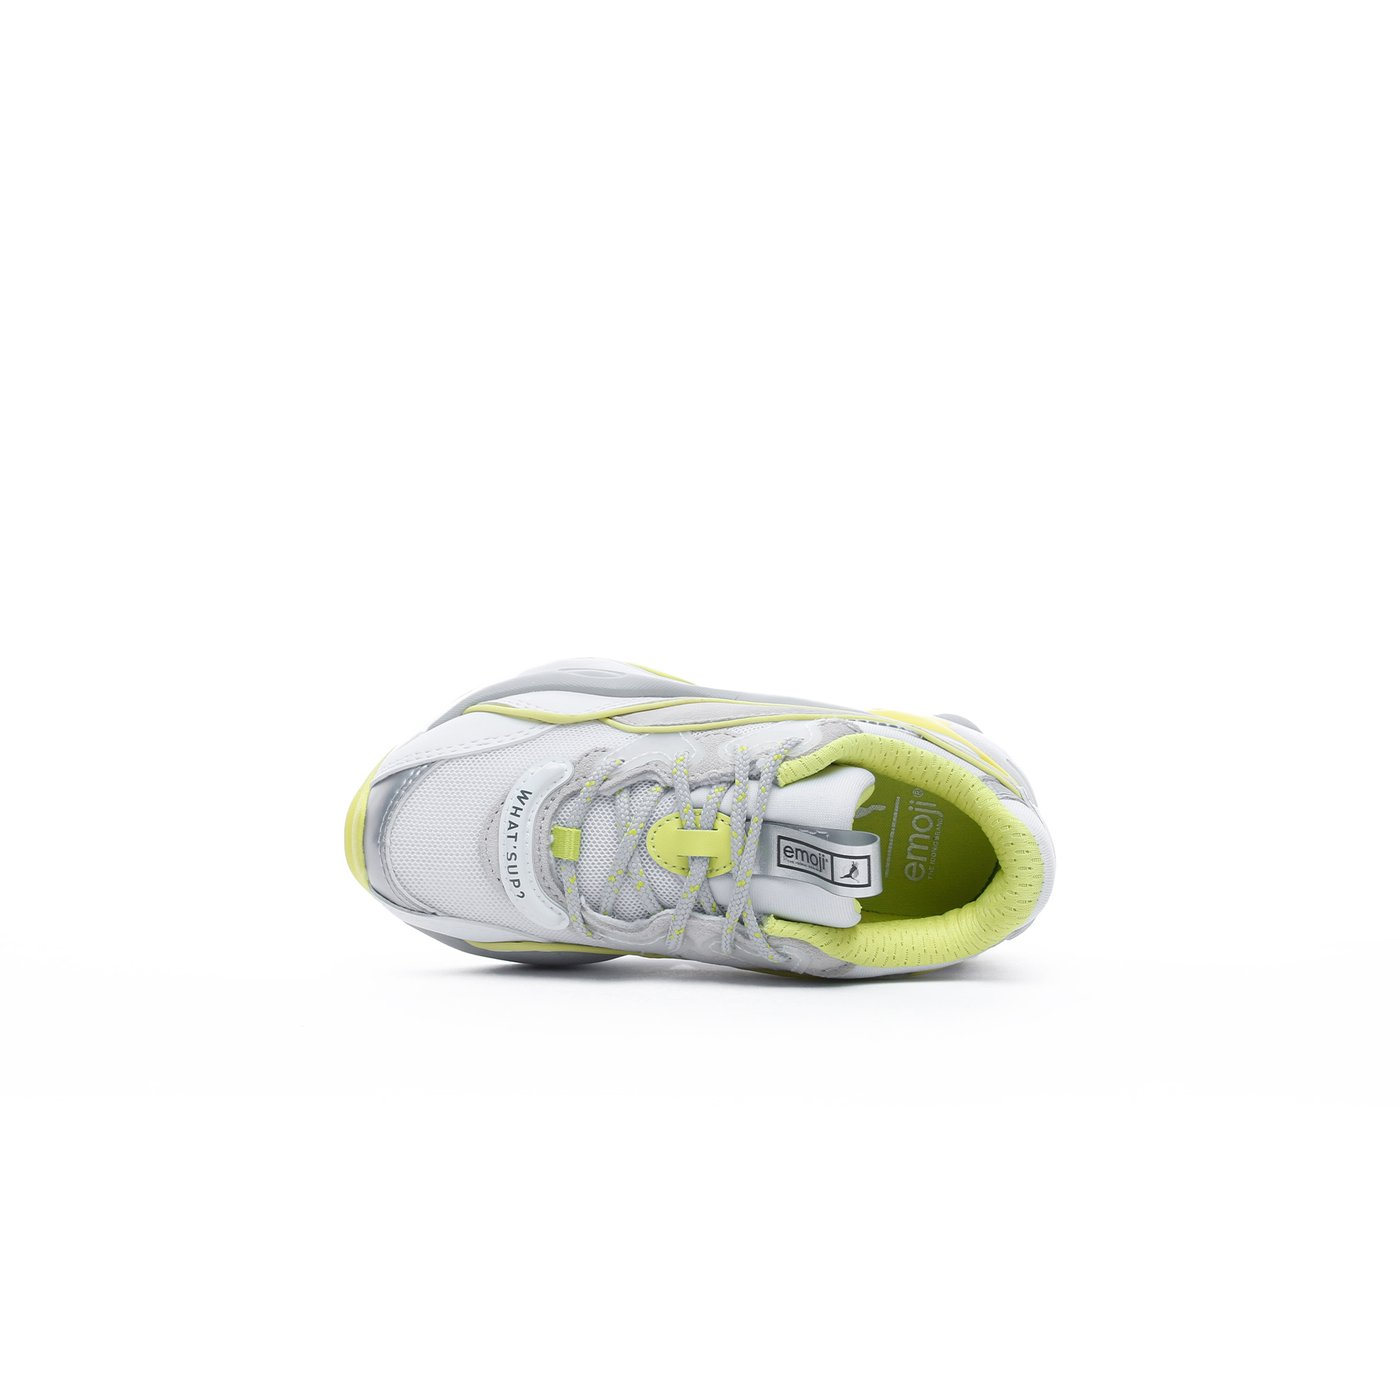 Puma RS-2K x Emoji PS Beyaz Çocuk Spor Ayakkabı